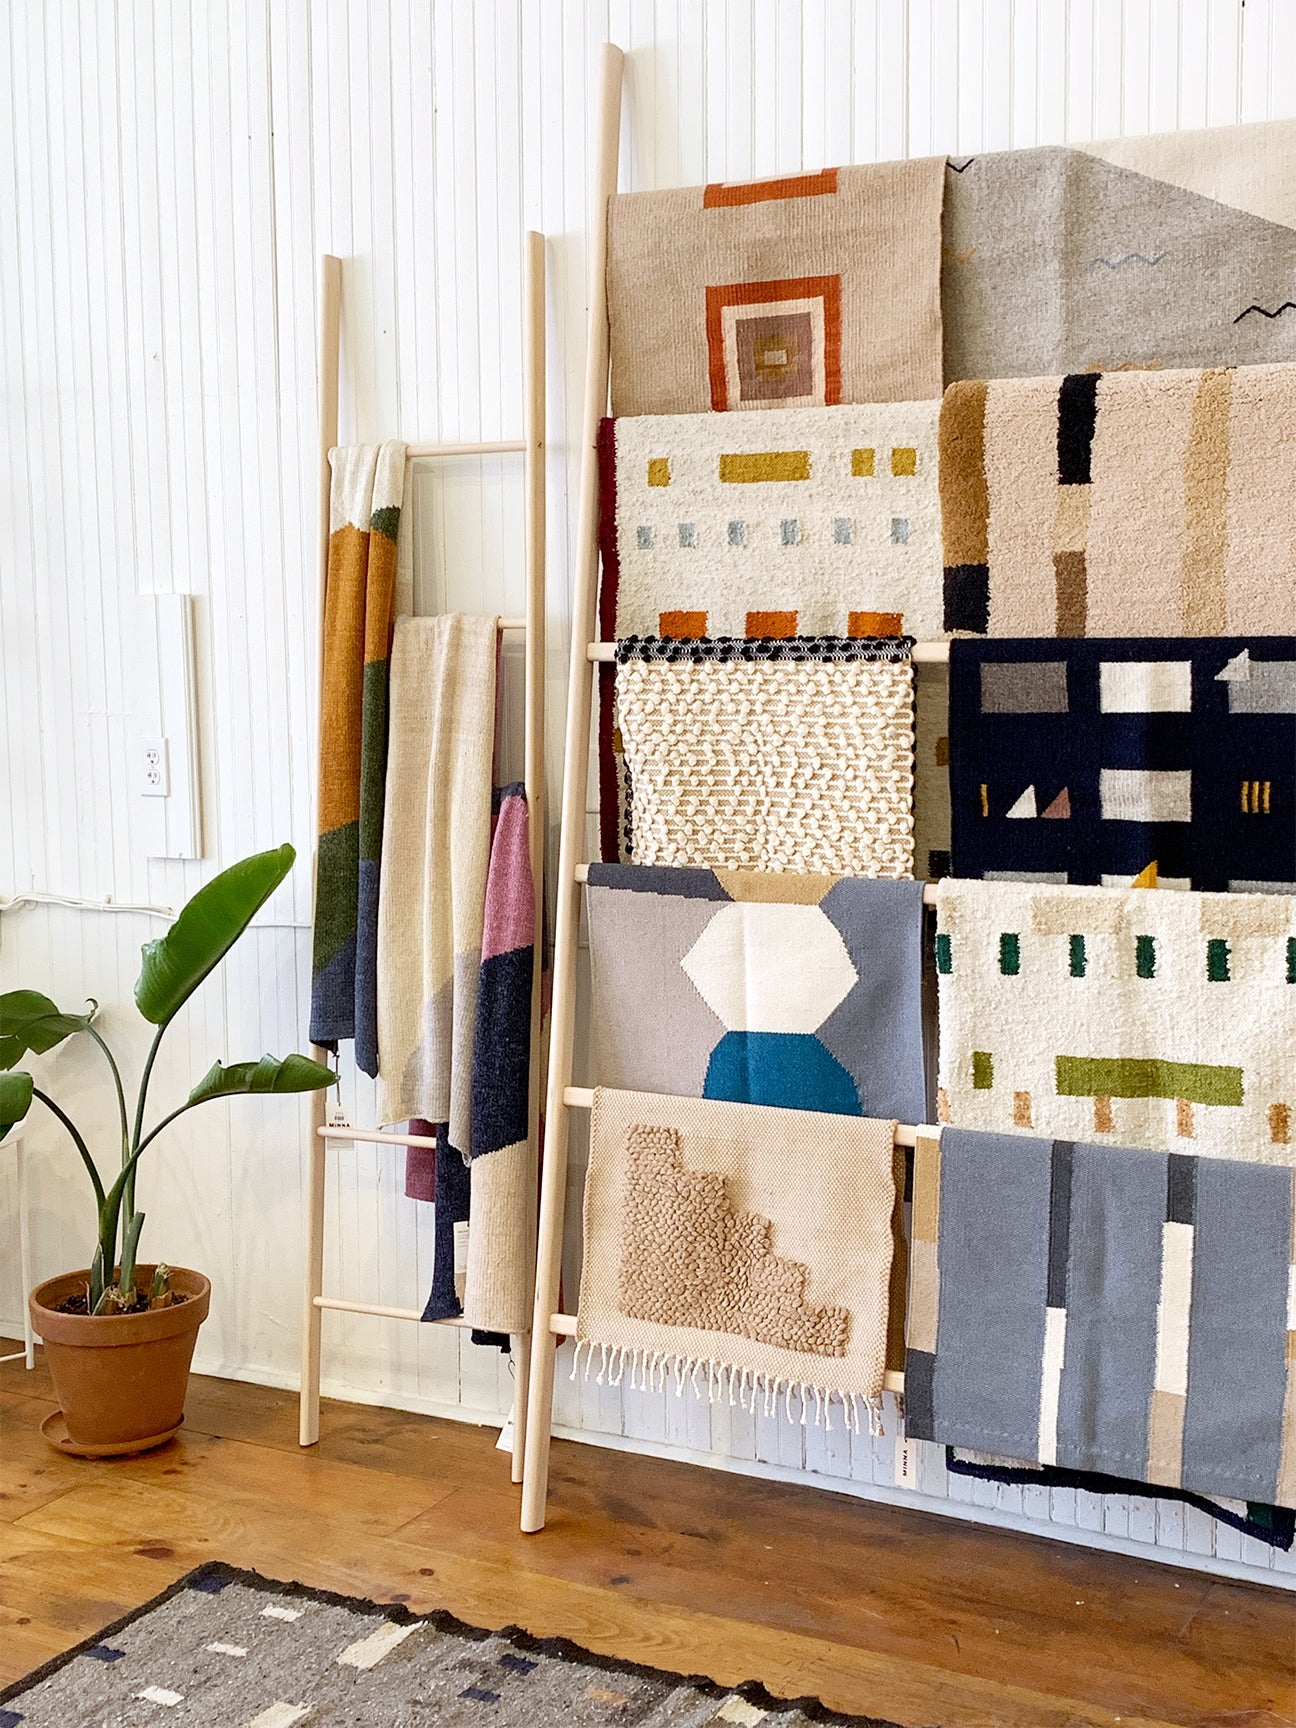 Textiles in MInna's Hudson Store